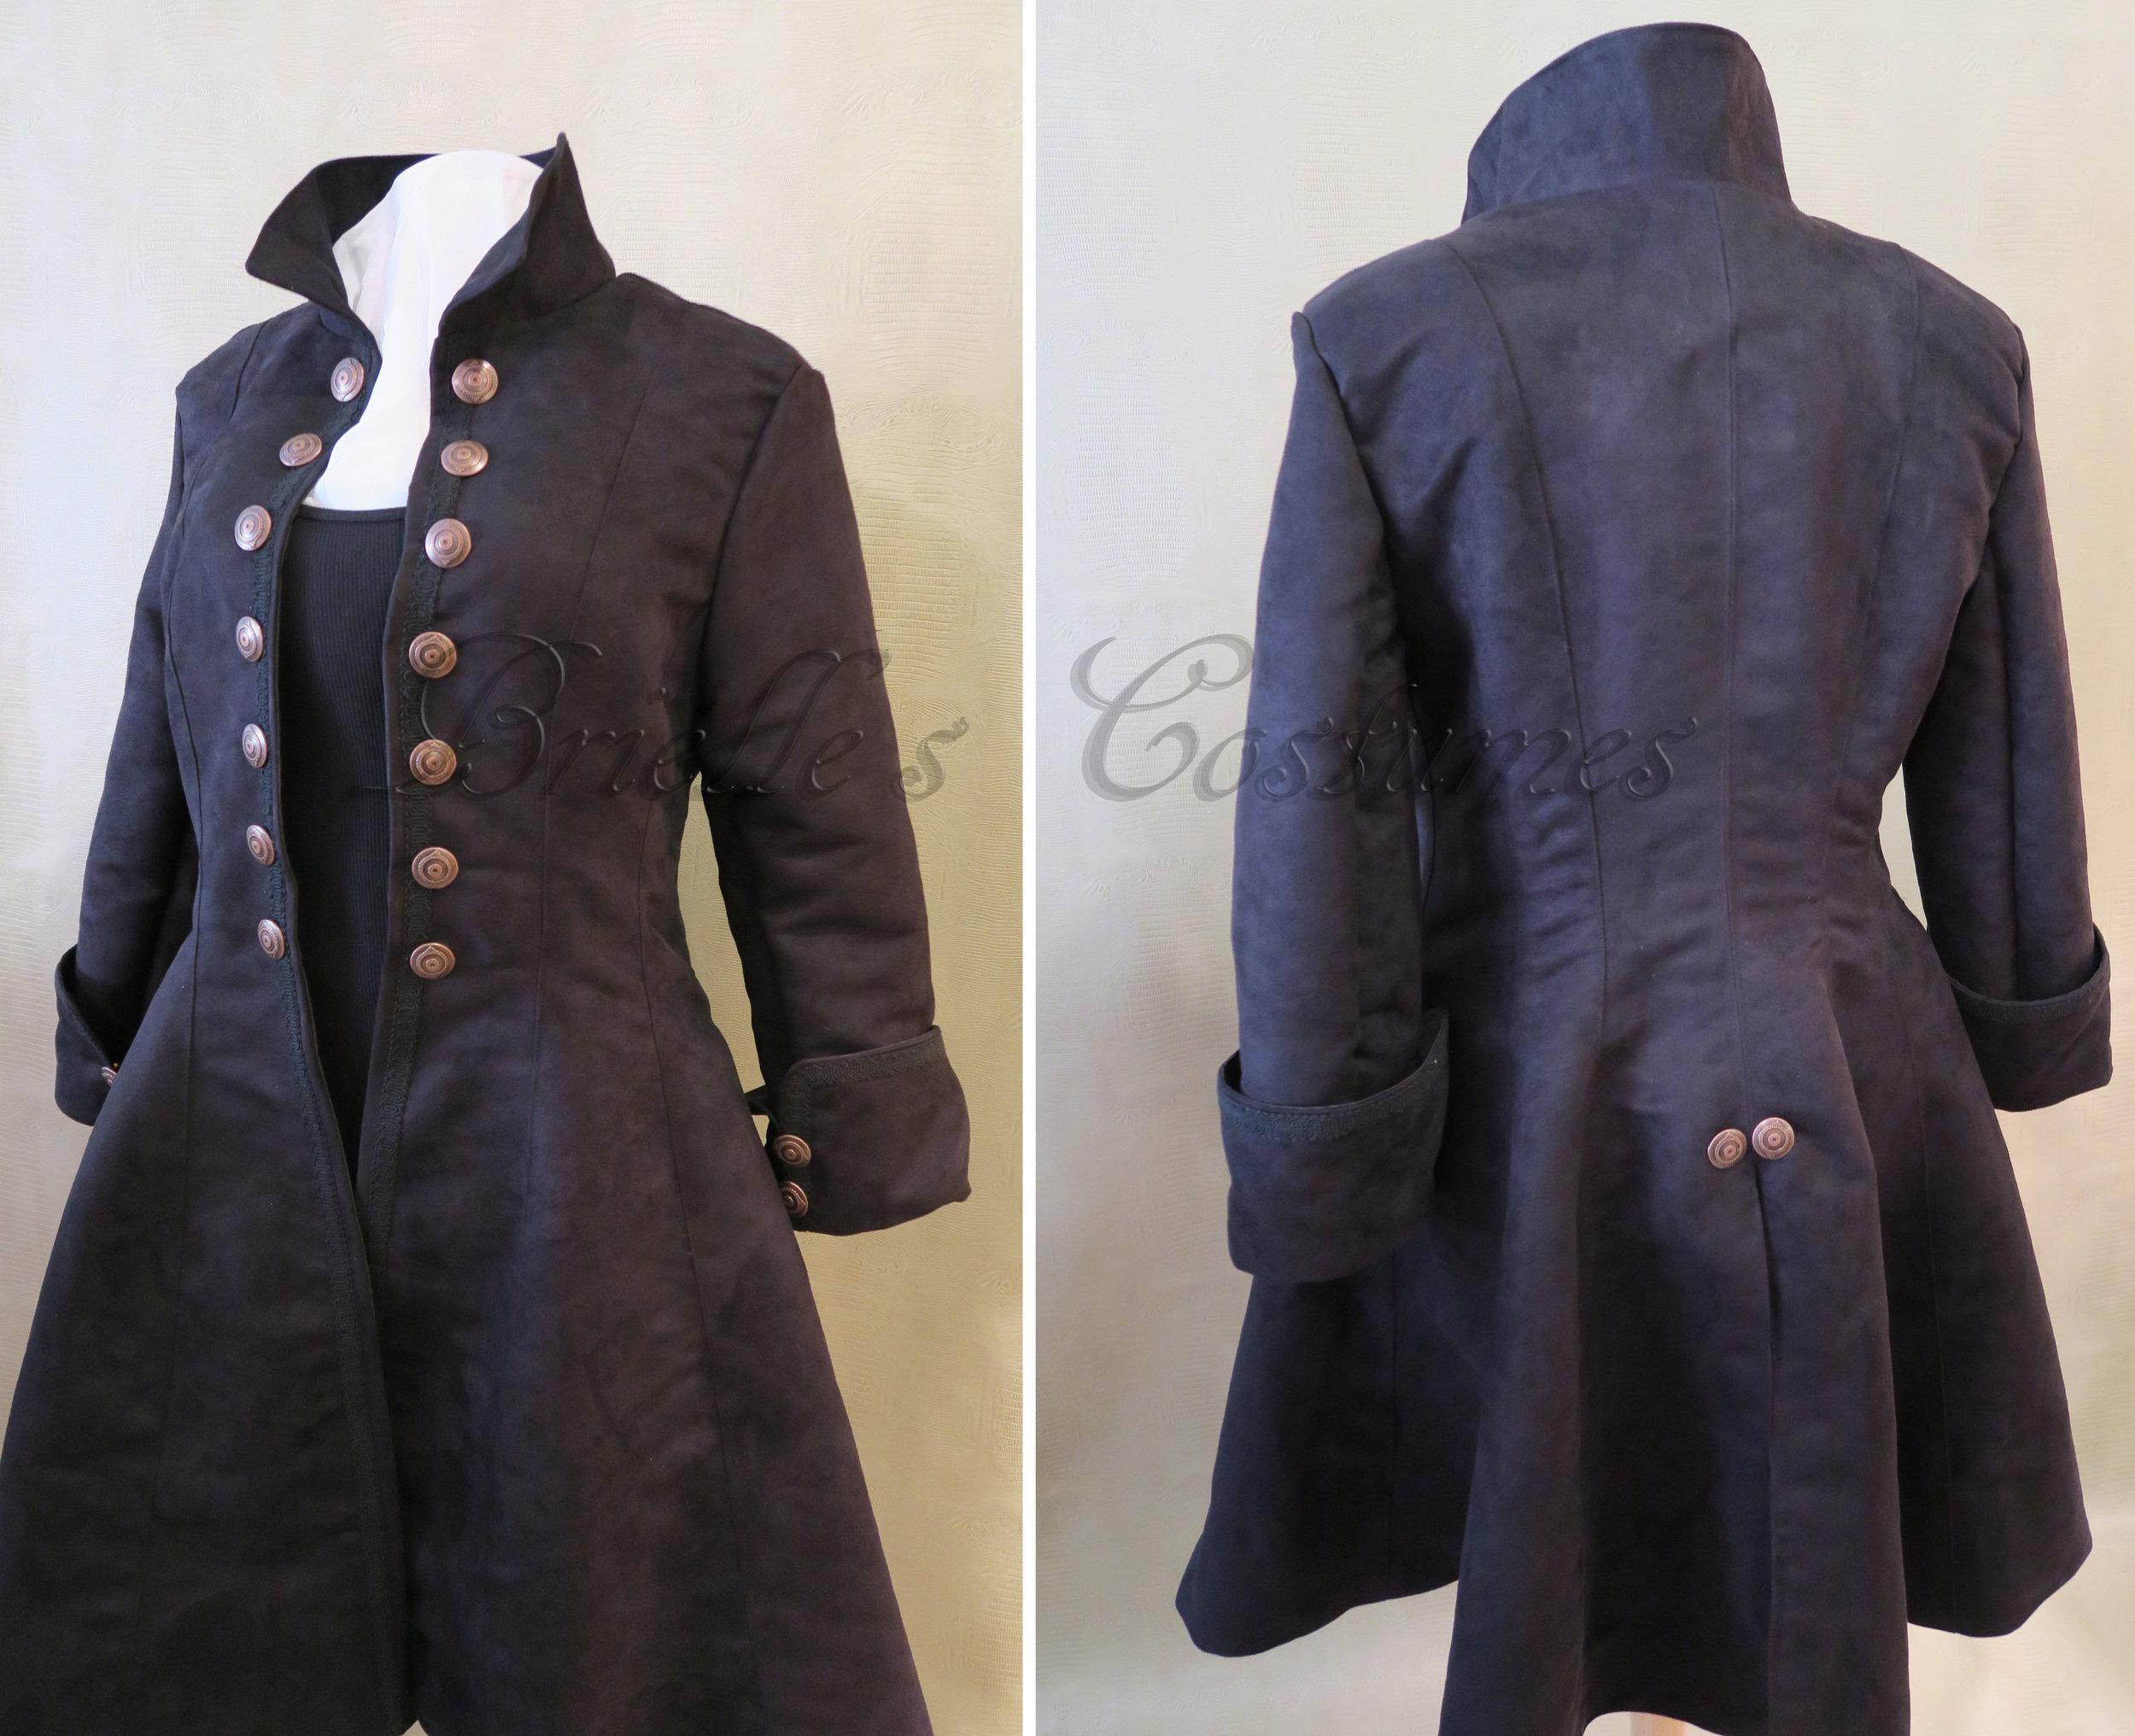 Pirate Coat1.JPG